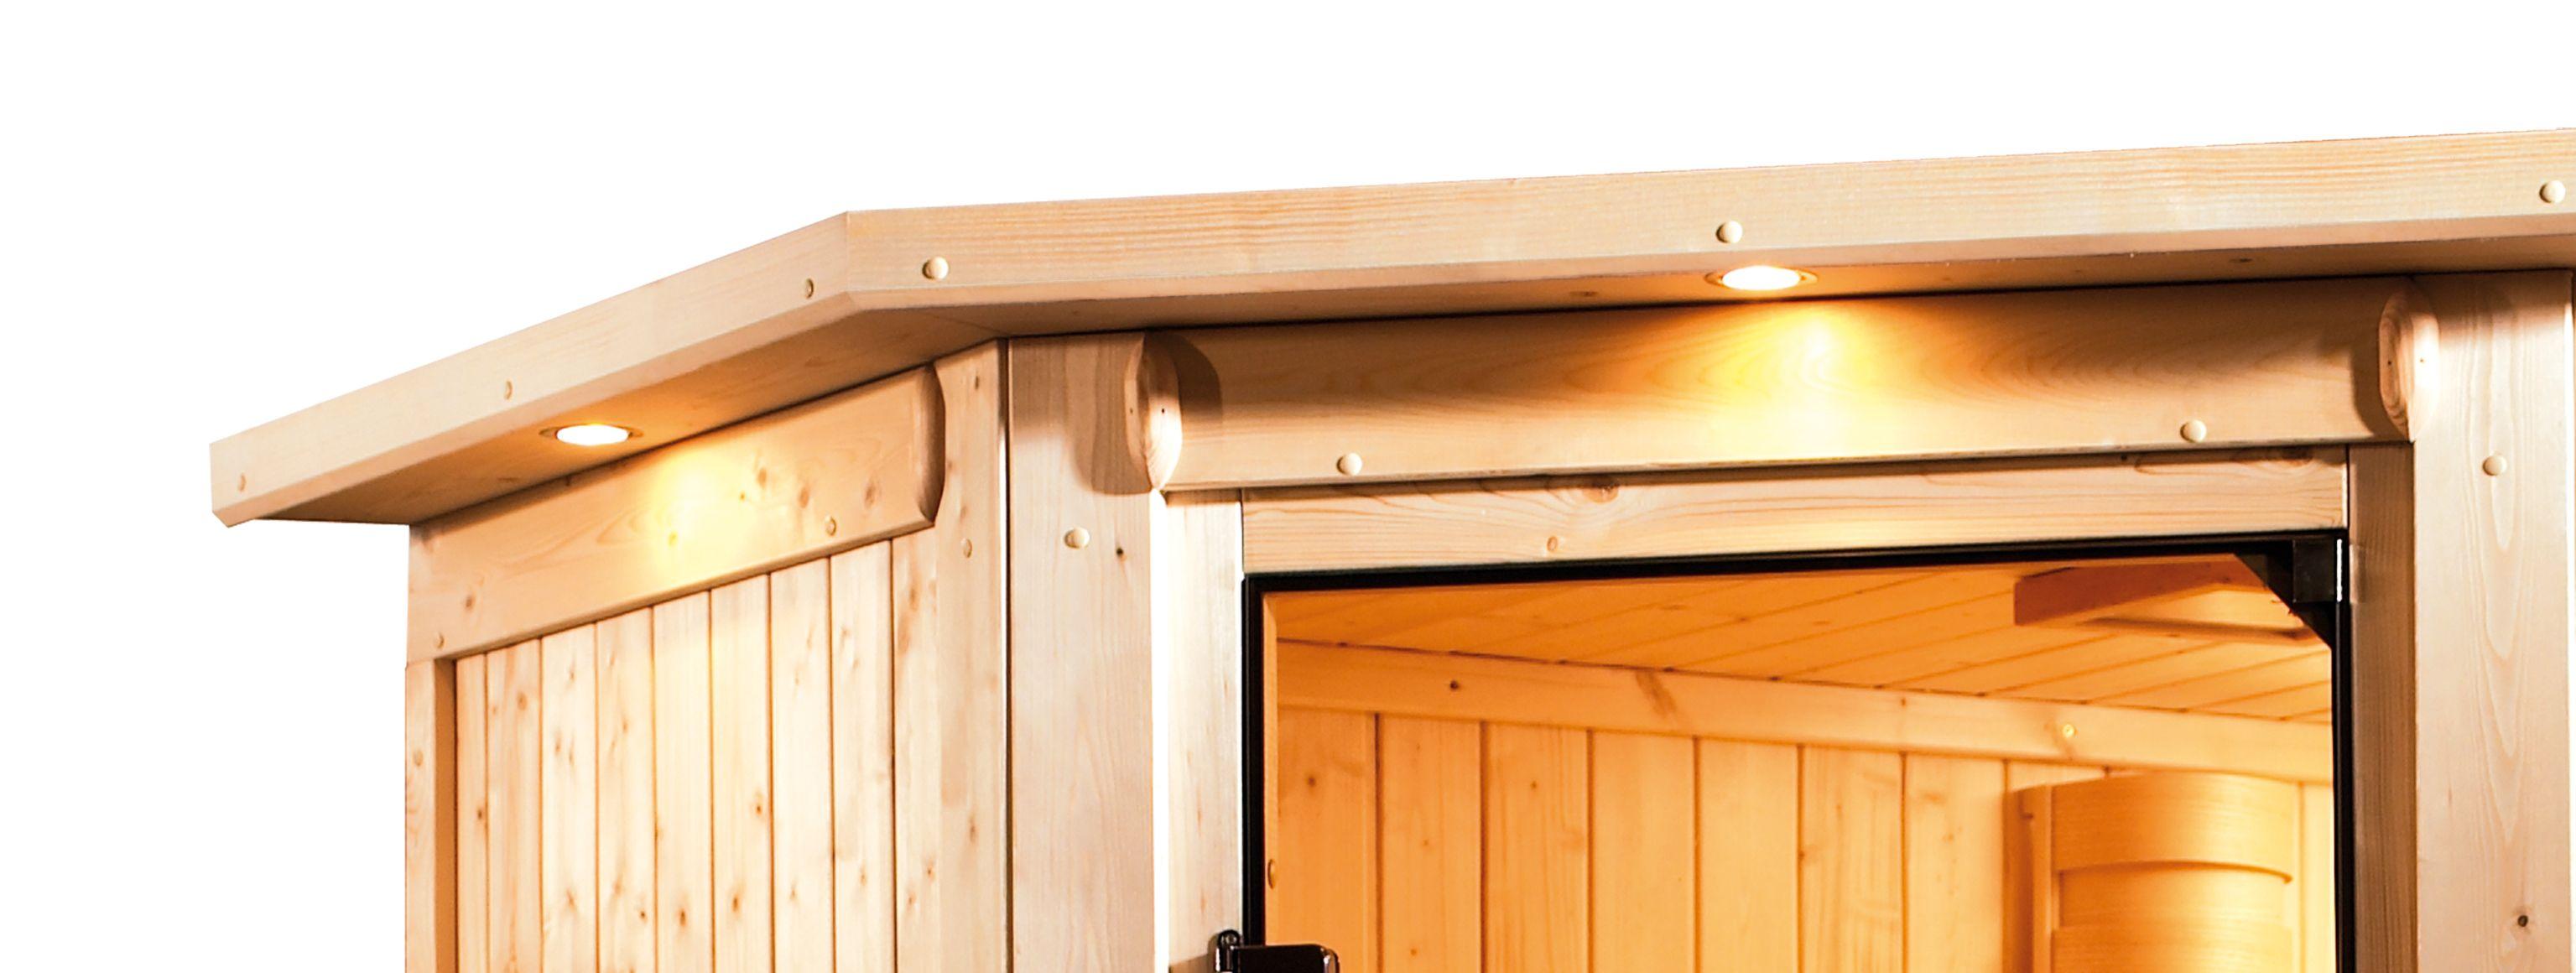 Woodfeeling Sauna Adelina 38mm Dachkranz Saunaofen 9kW intern Bild 10